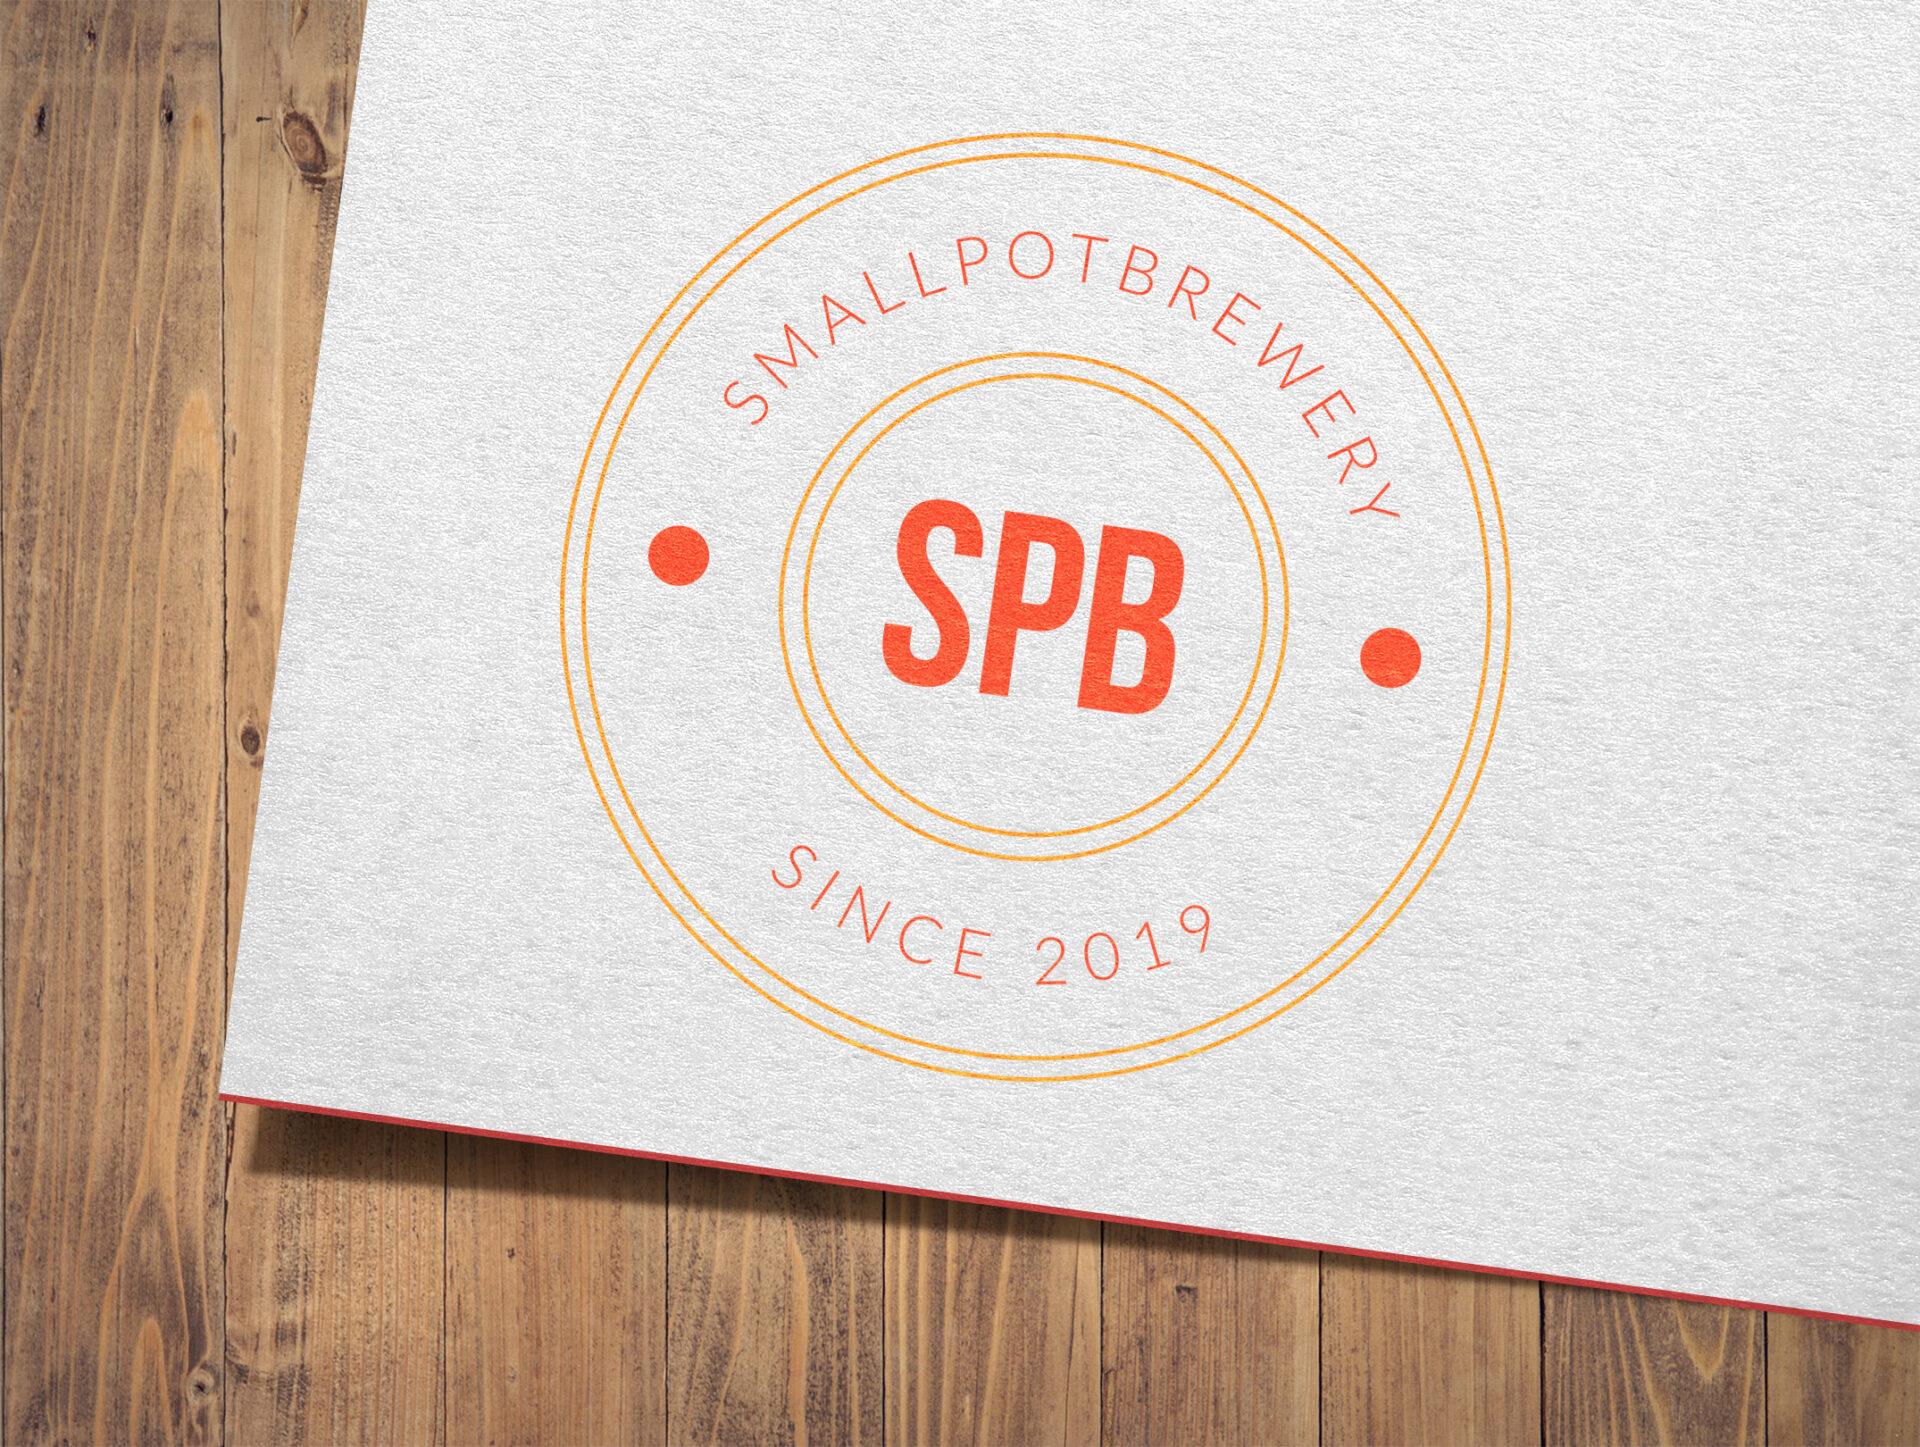 smallpotbrewery